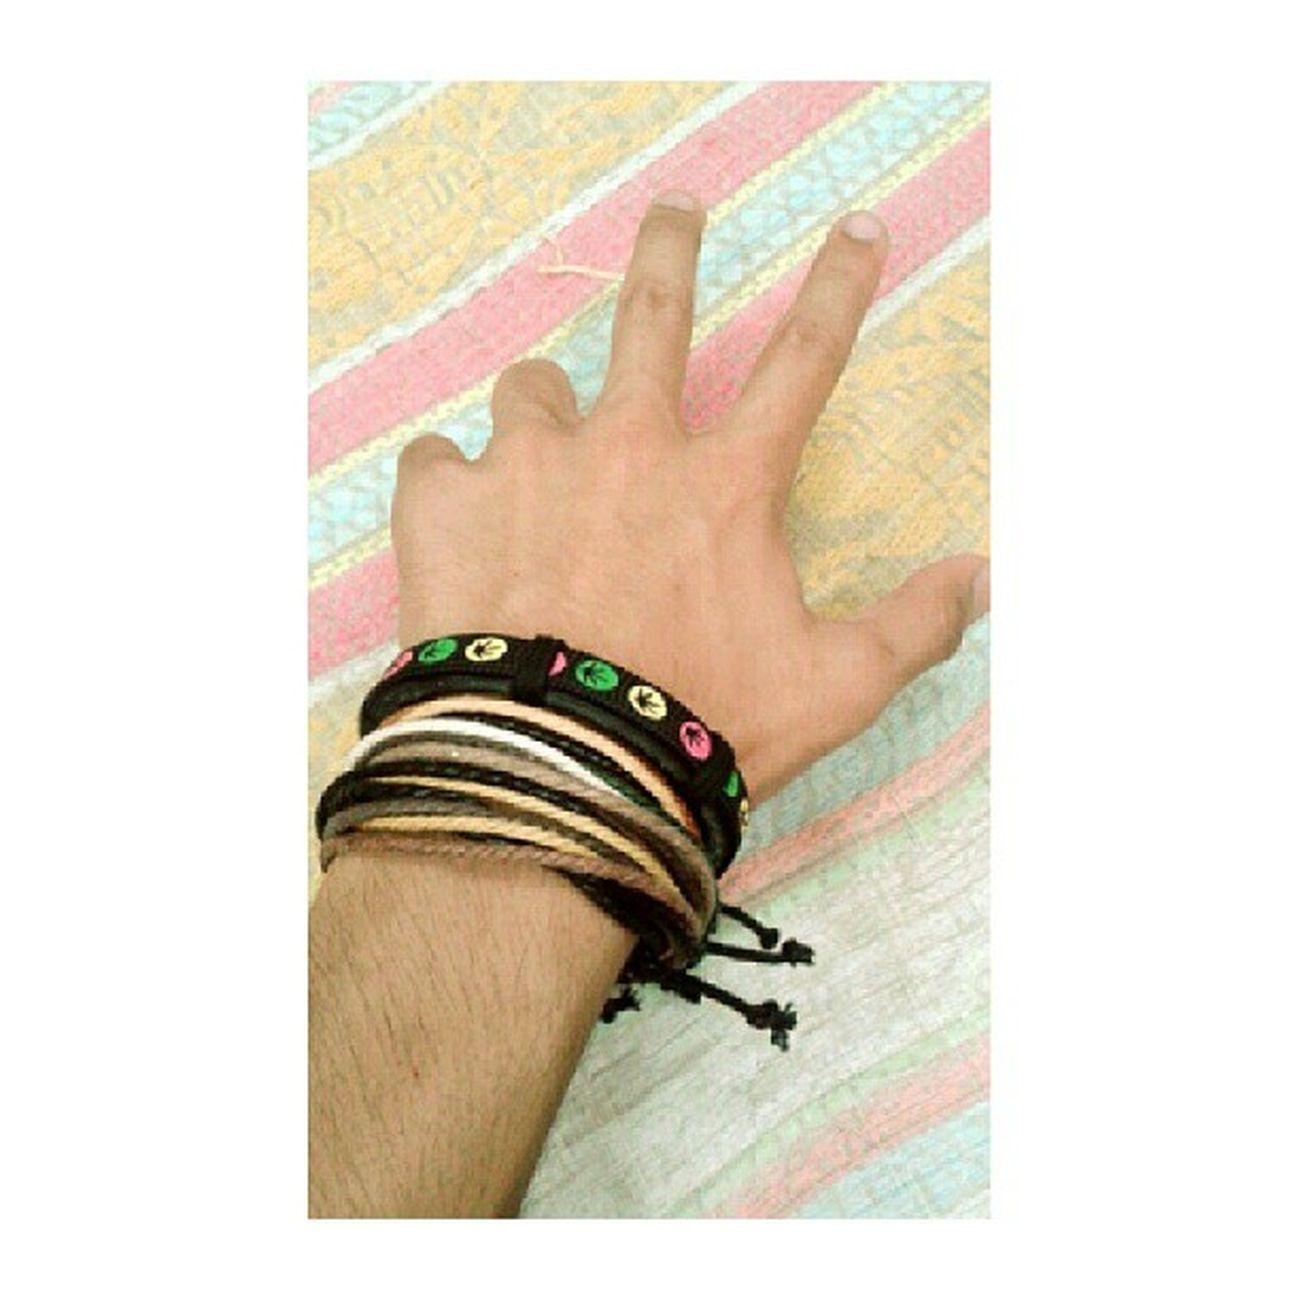 tangan . tanpa kau takkan aku jadi id student :) alhamdulillah . malam nie @muhdqusyairiii tgh pack brg2, nk balik dah .. esok aku pulak . yeahhhh . tak sabar ! :D Stylista